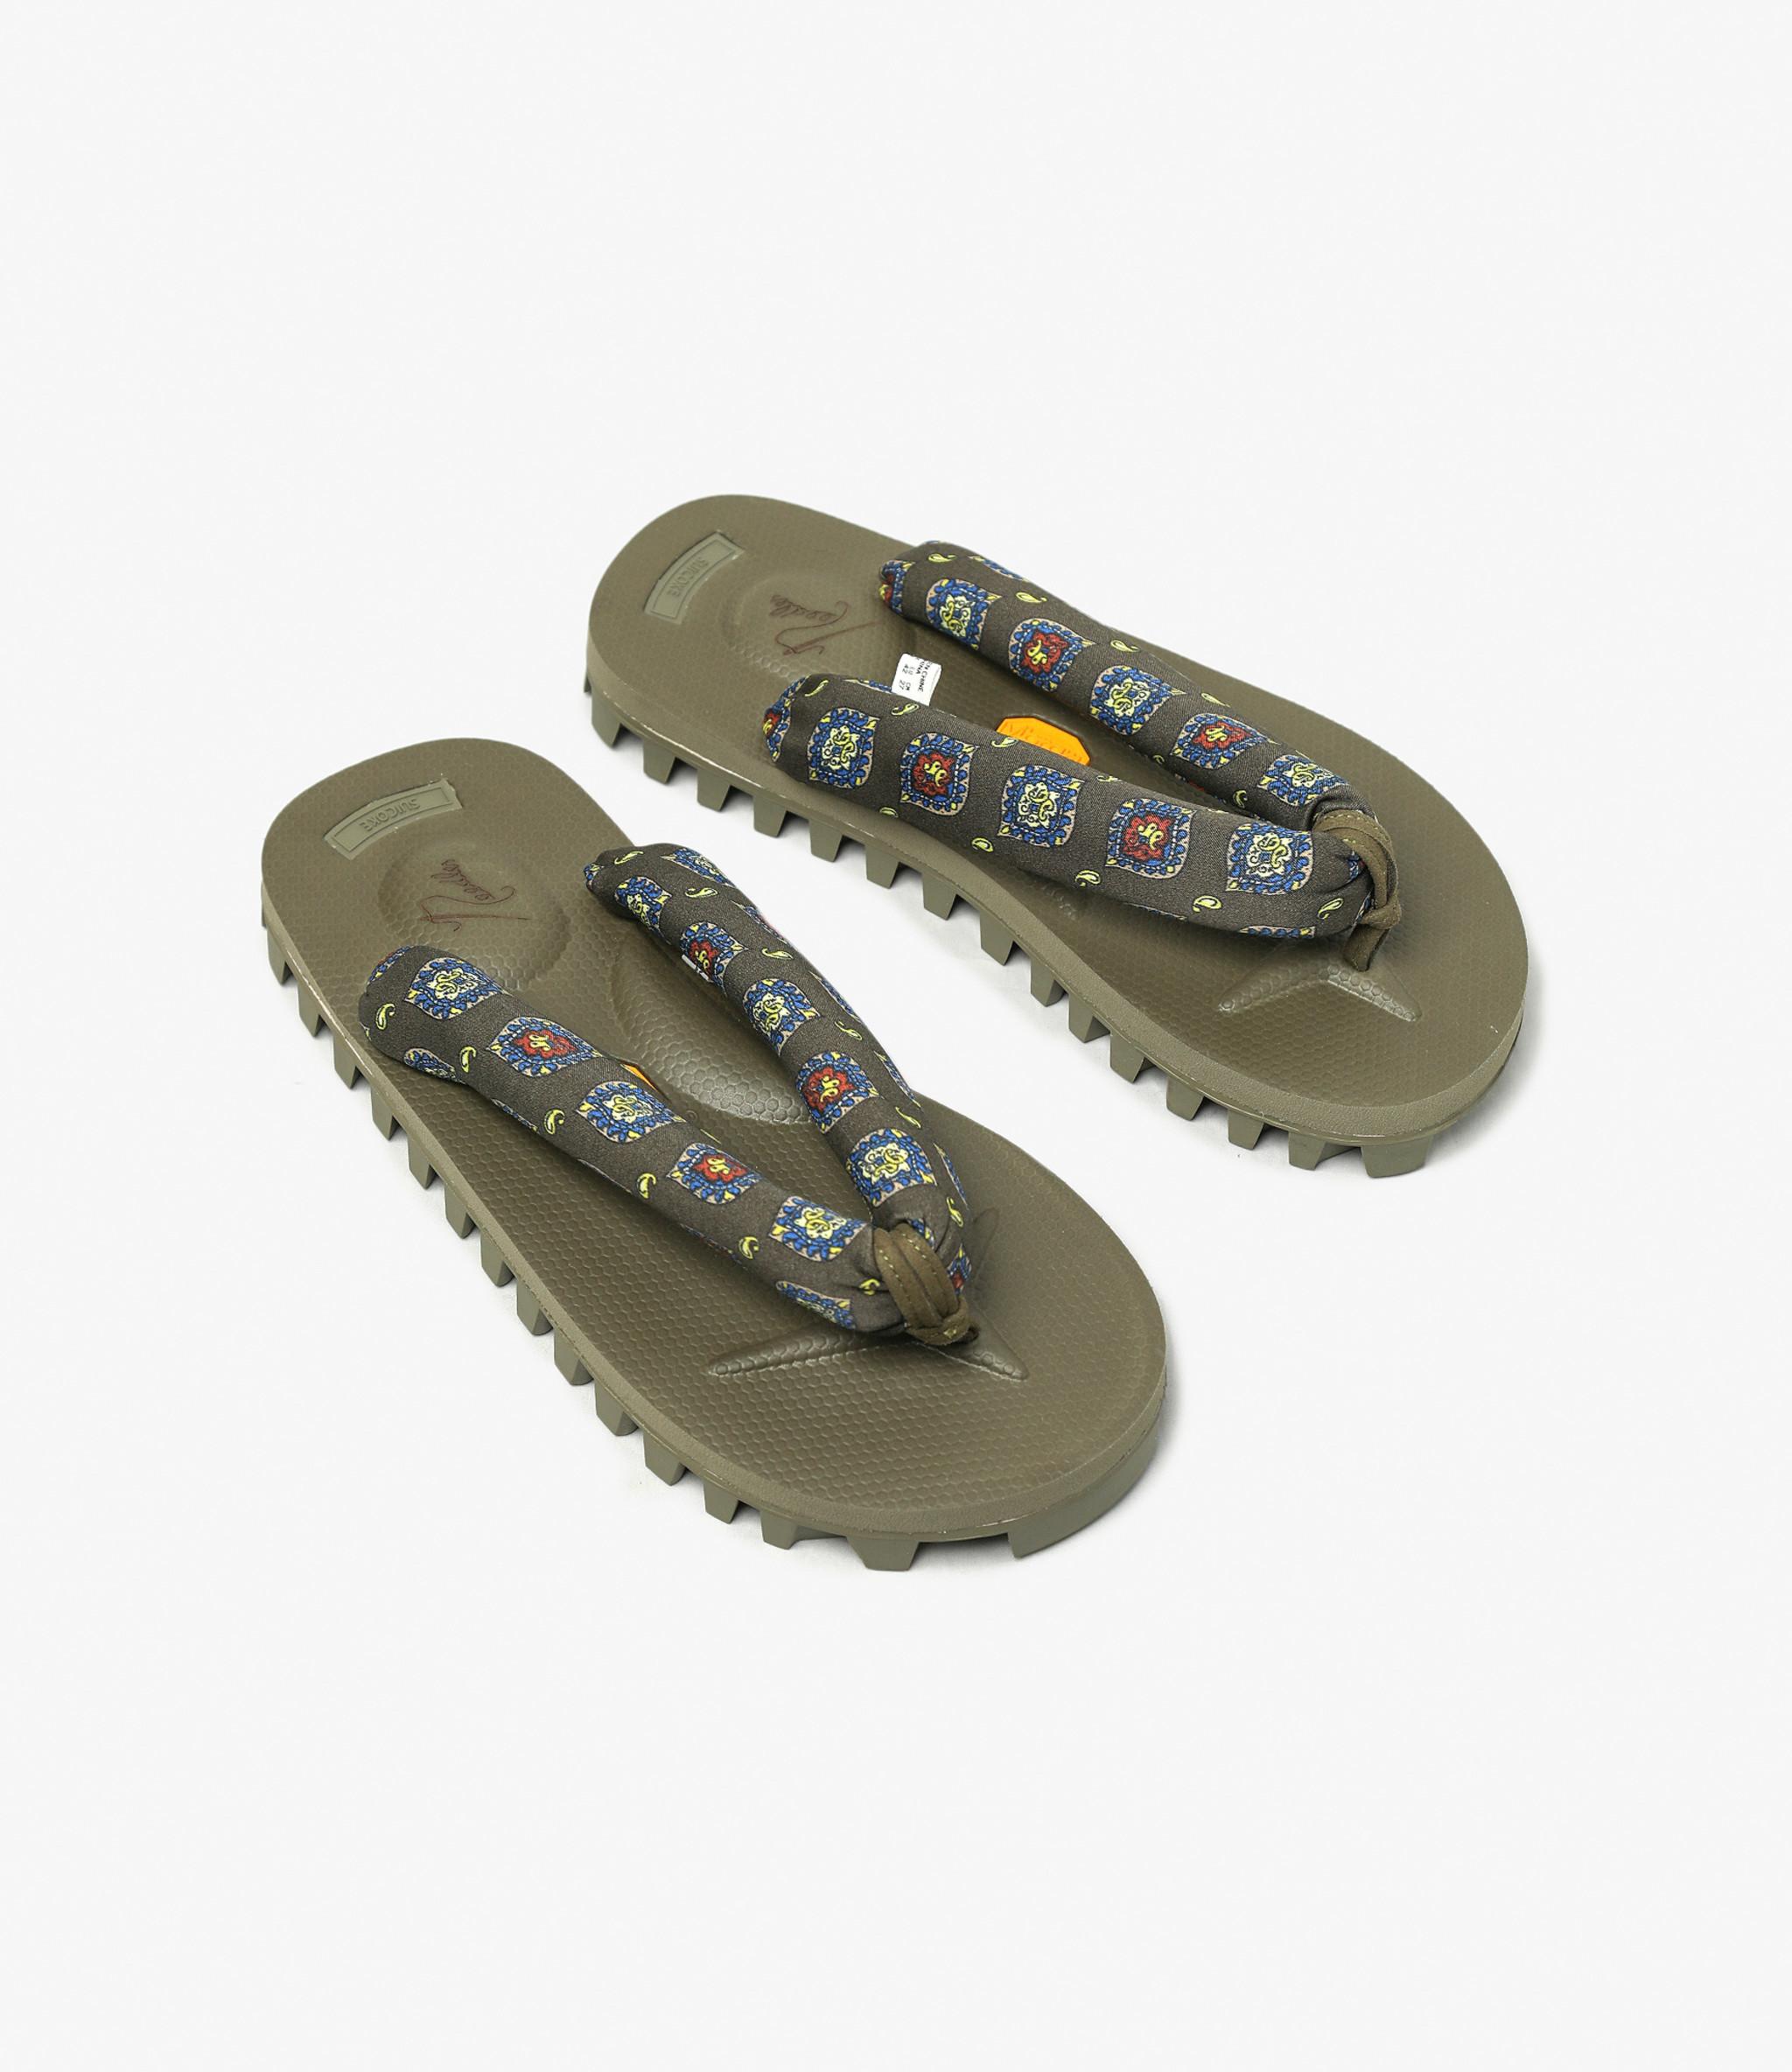 Suicoke Suicoke x Needles  - Thong Sandal Vibram Sole - Olive Fine Ptn / Olive